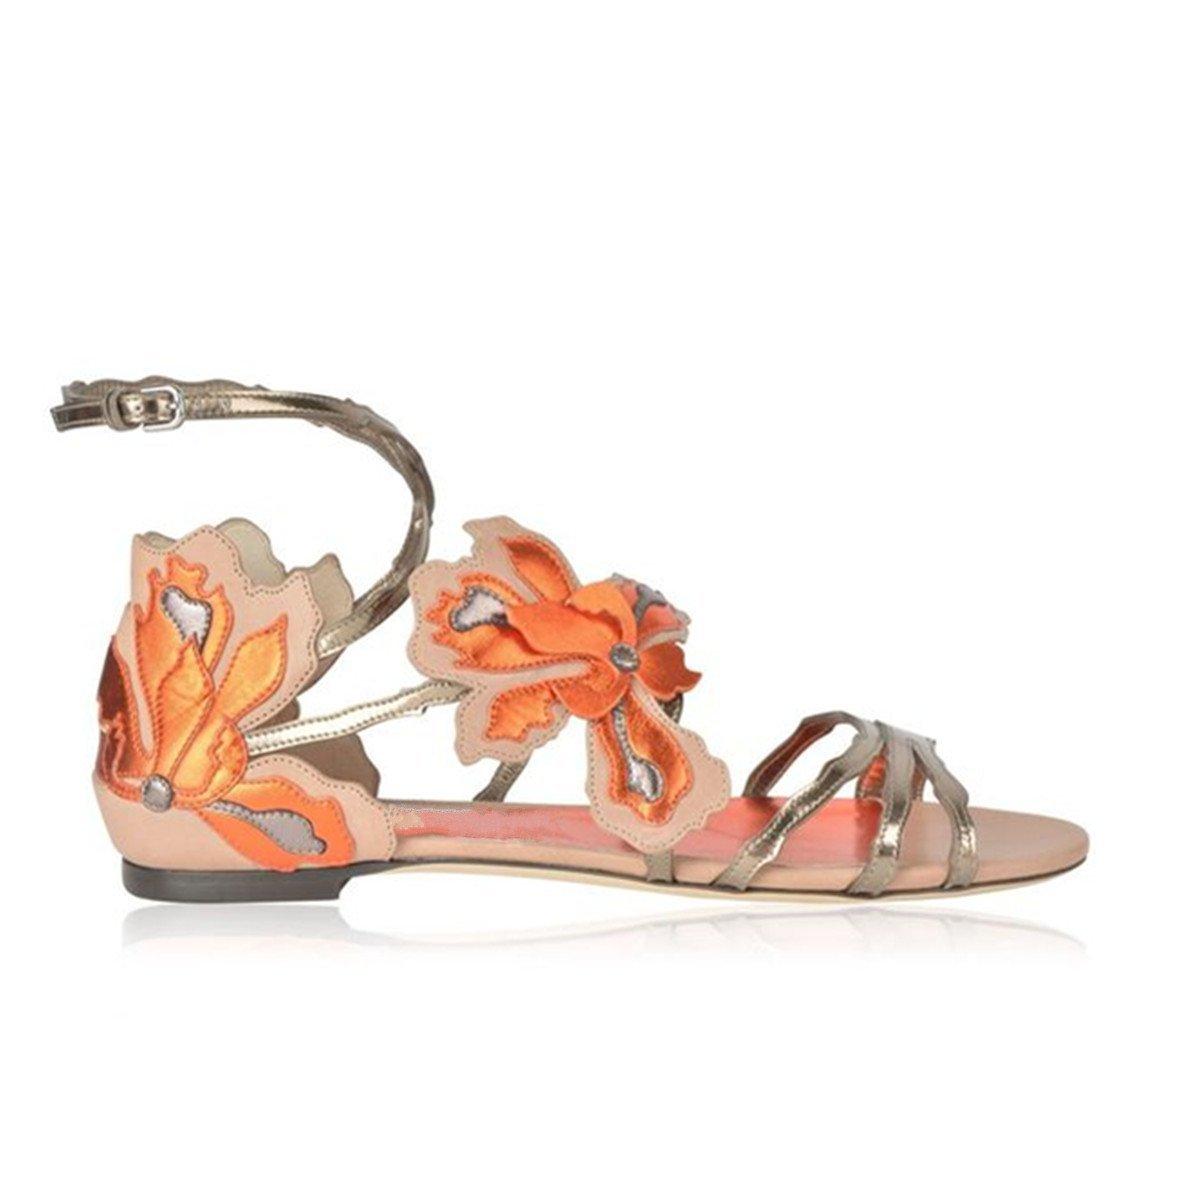 Women's Cross Ankle Strap Floral 3 Color Open-toe Flat Sandals B072SWND6L 10 B(M) US|Pink